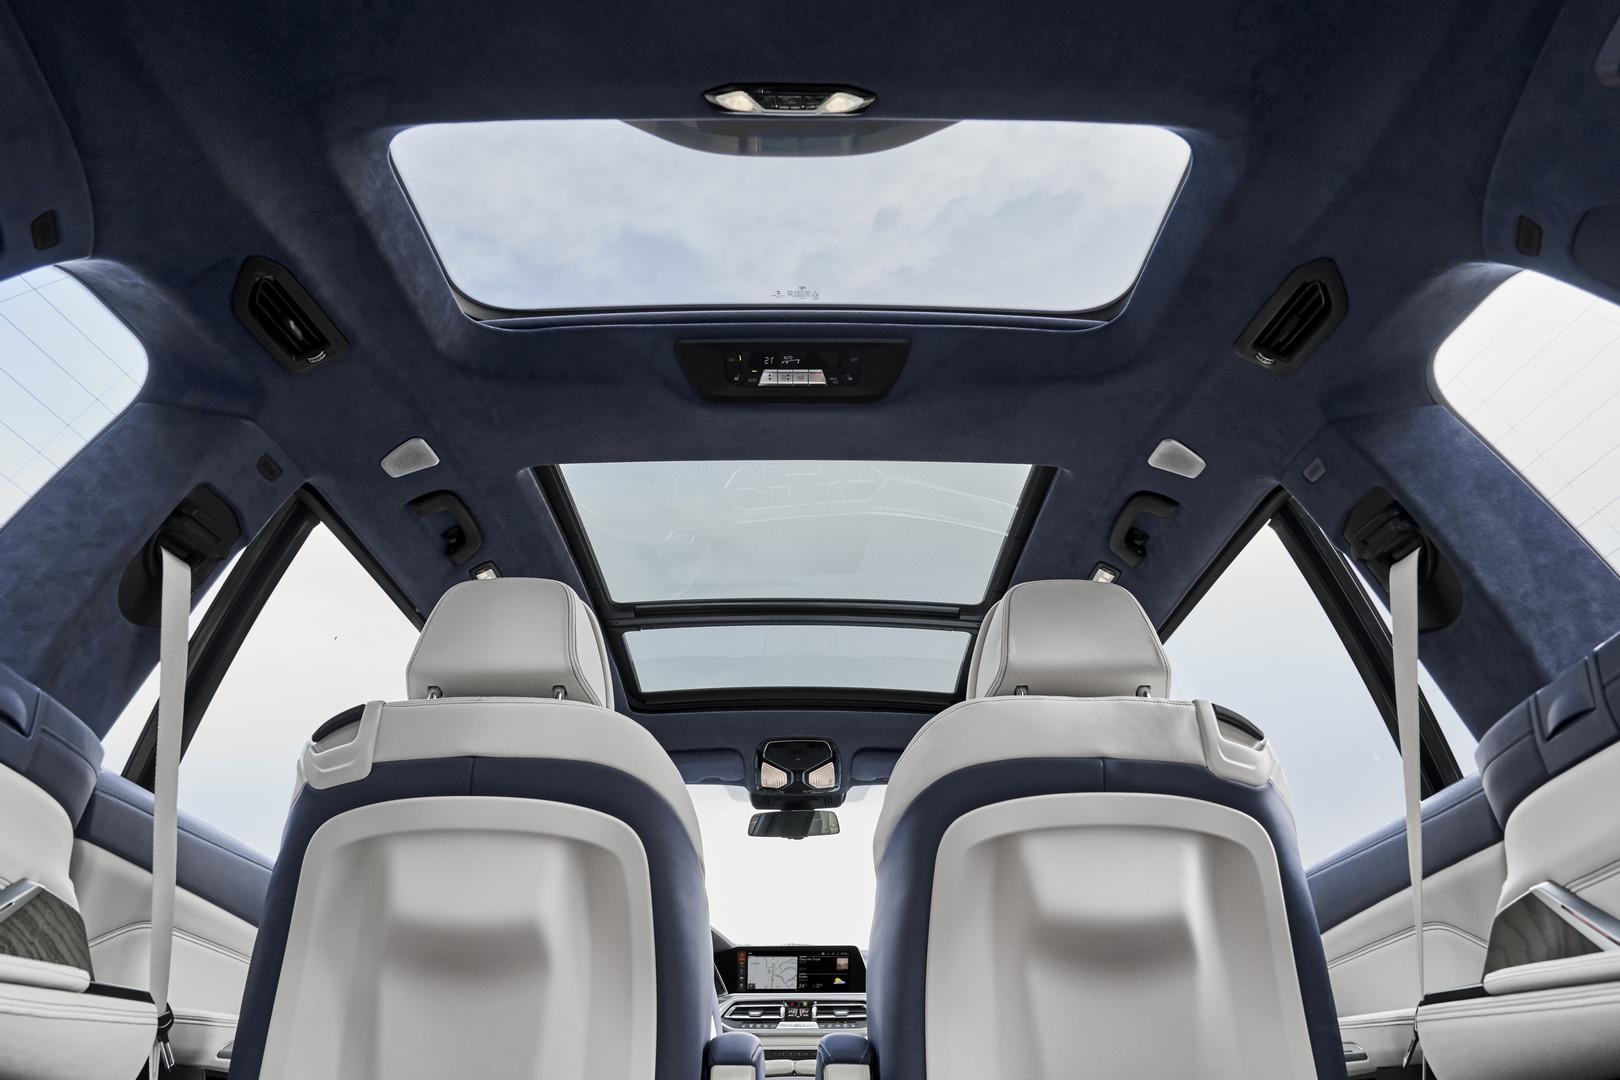 2019 BMW X7 Sunroof